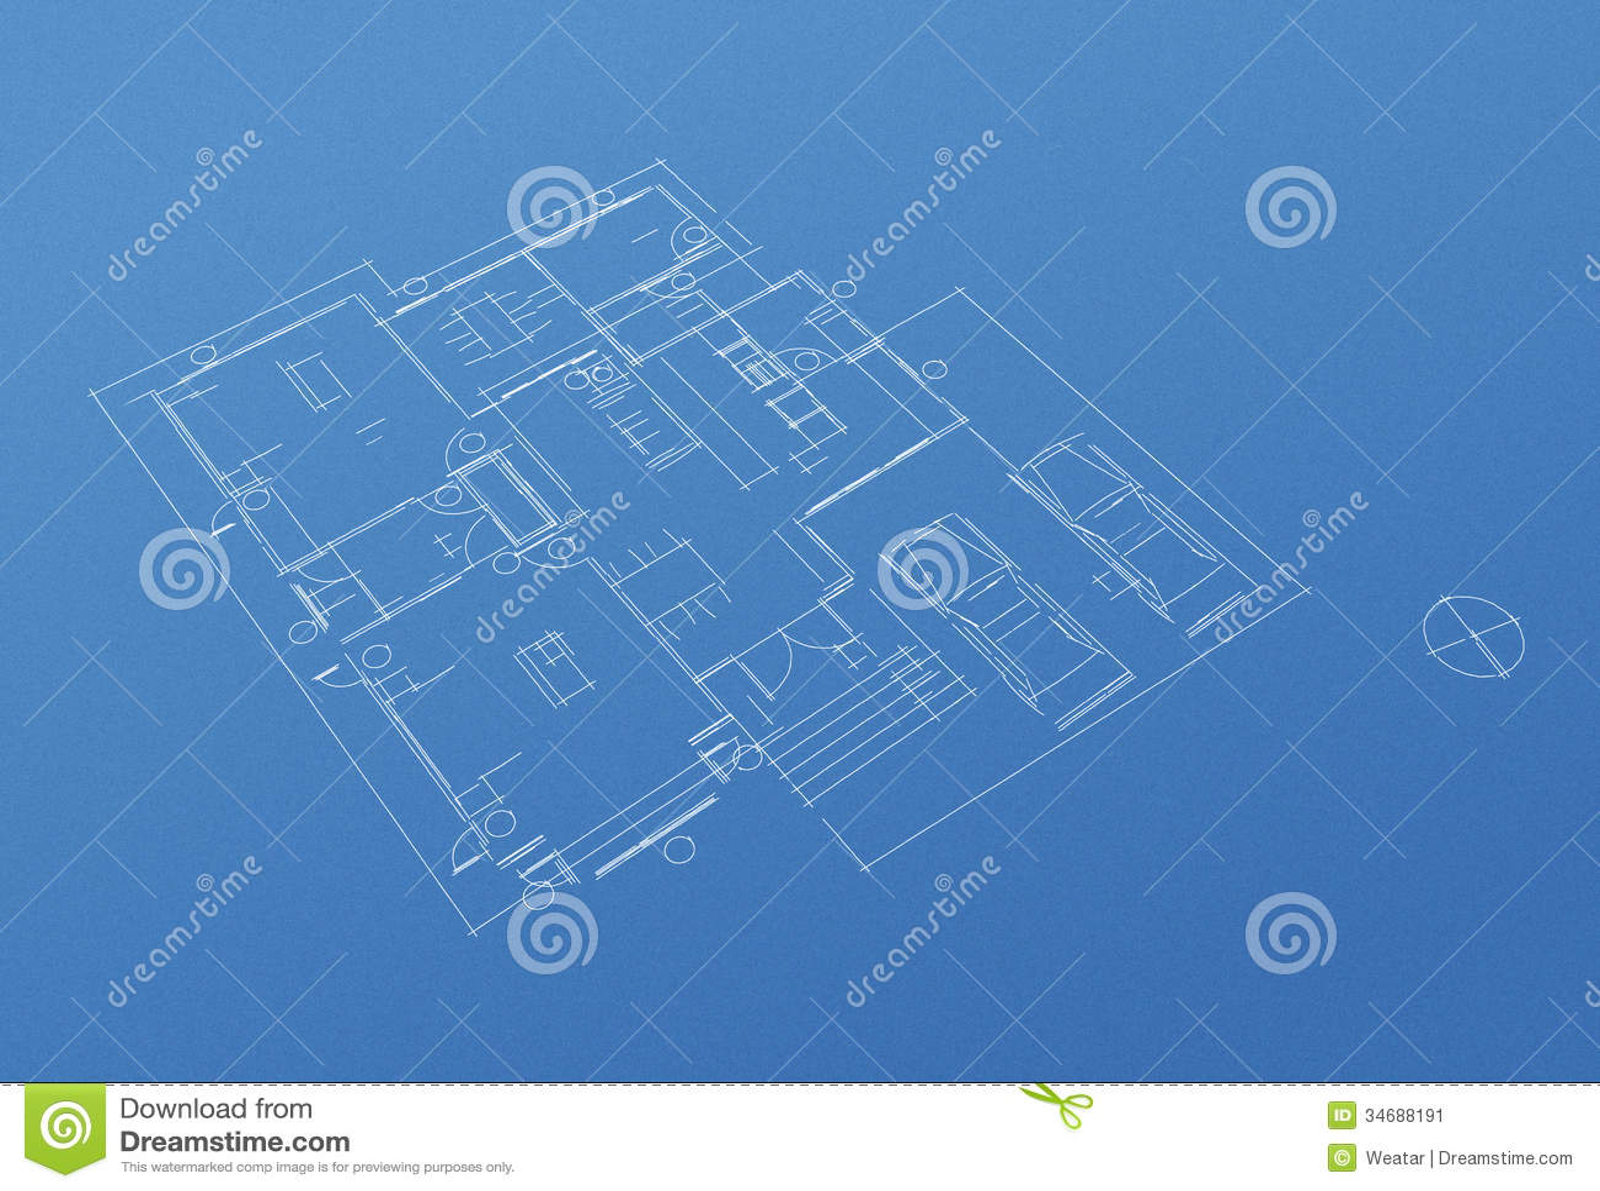 House floor plan blueprint stock image image 34688191 for Floor plan maker free no download